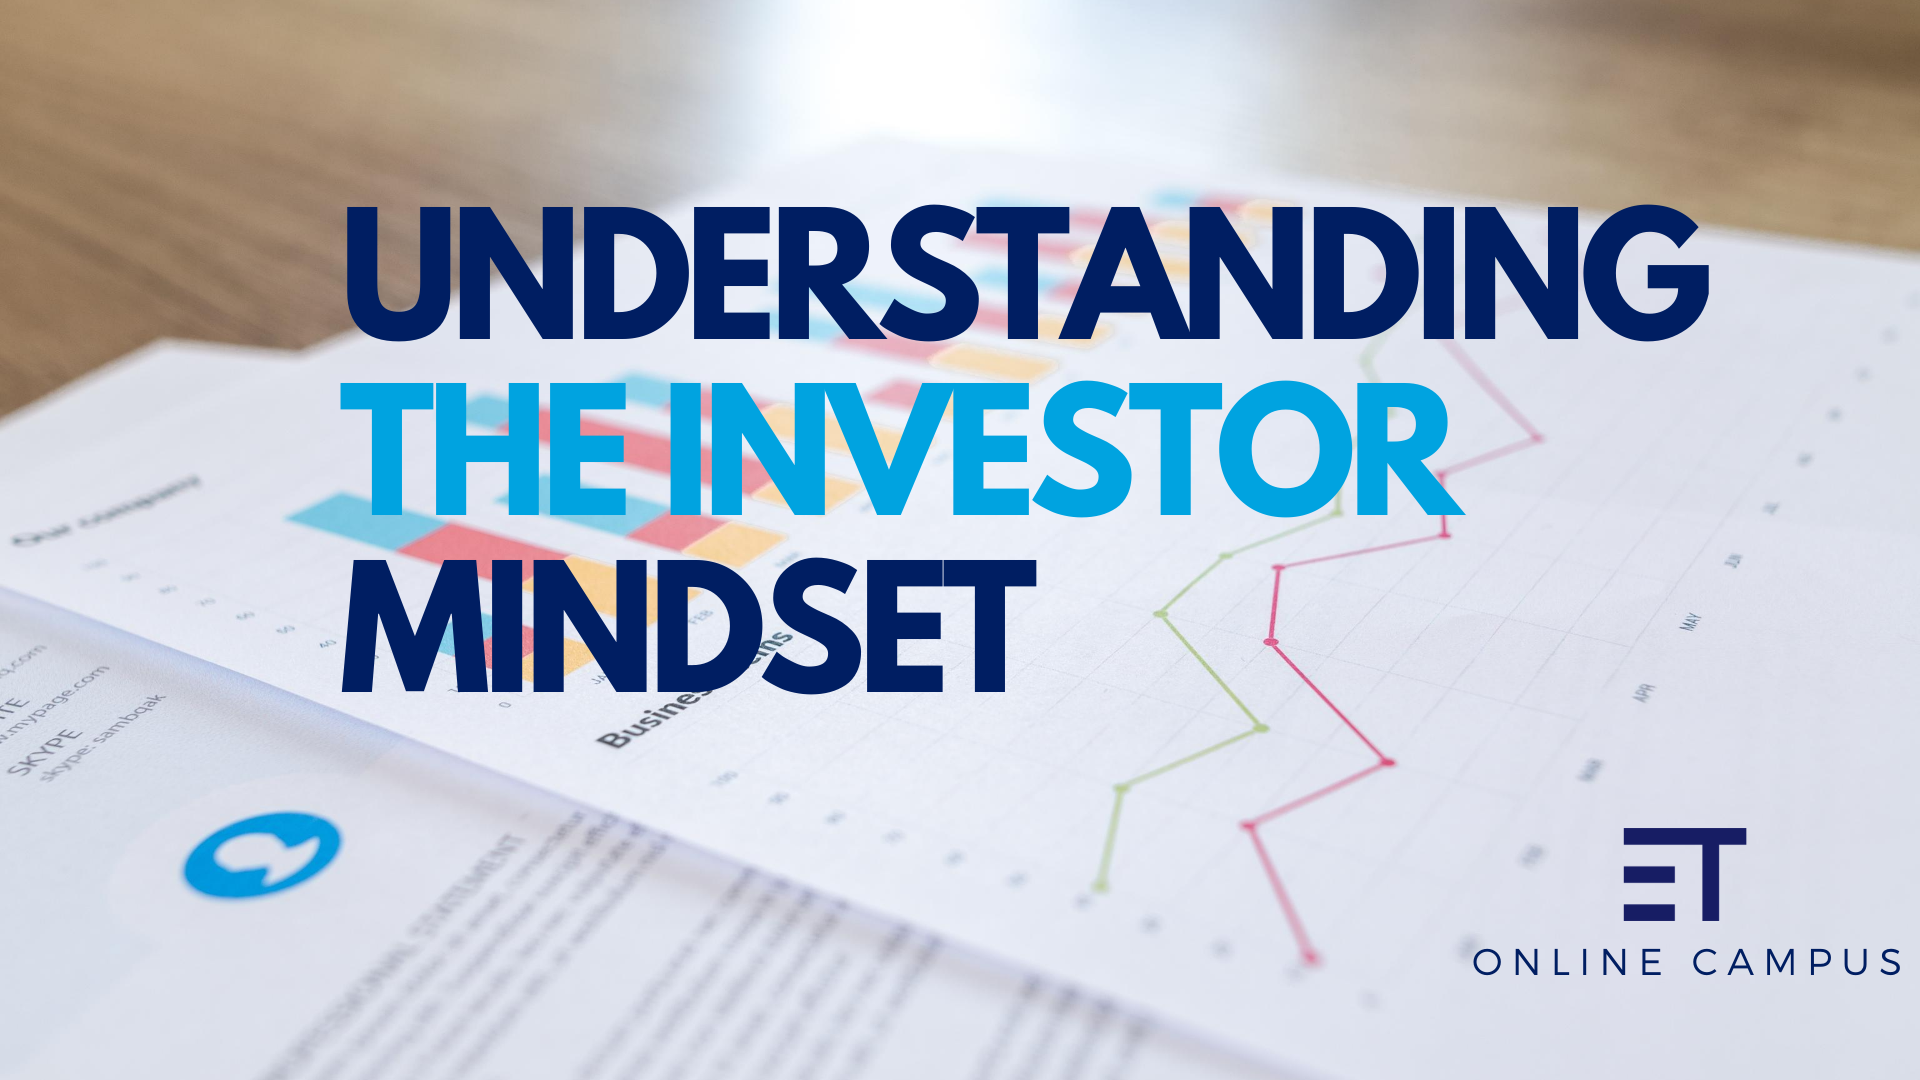 Understanding The Investor Mindset